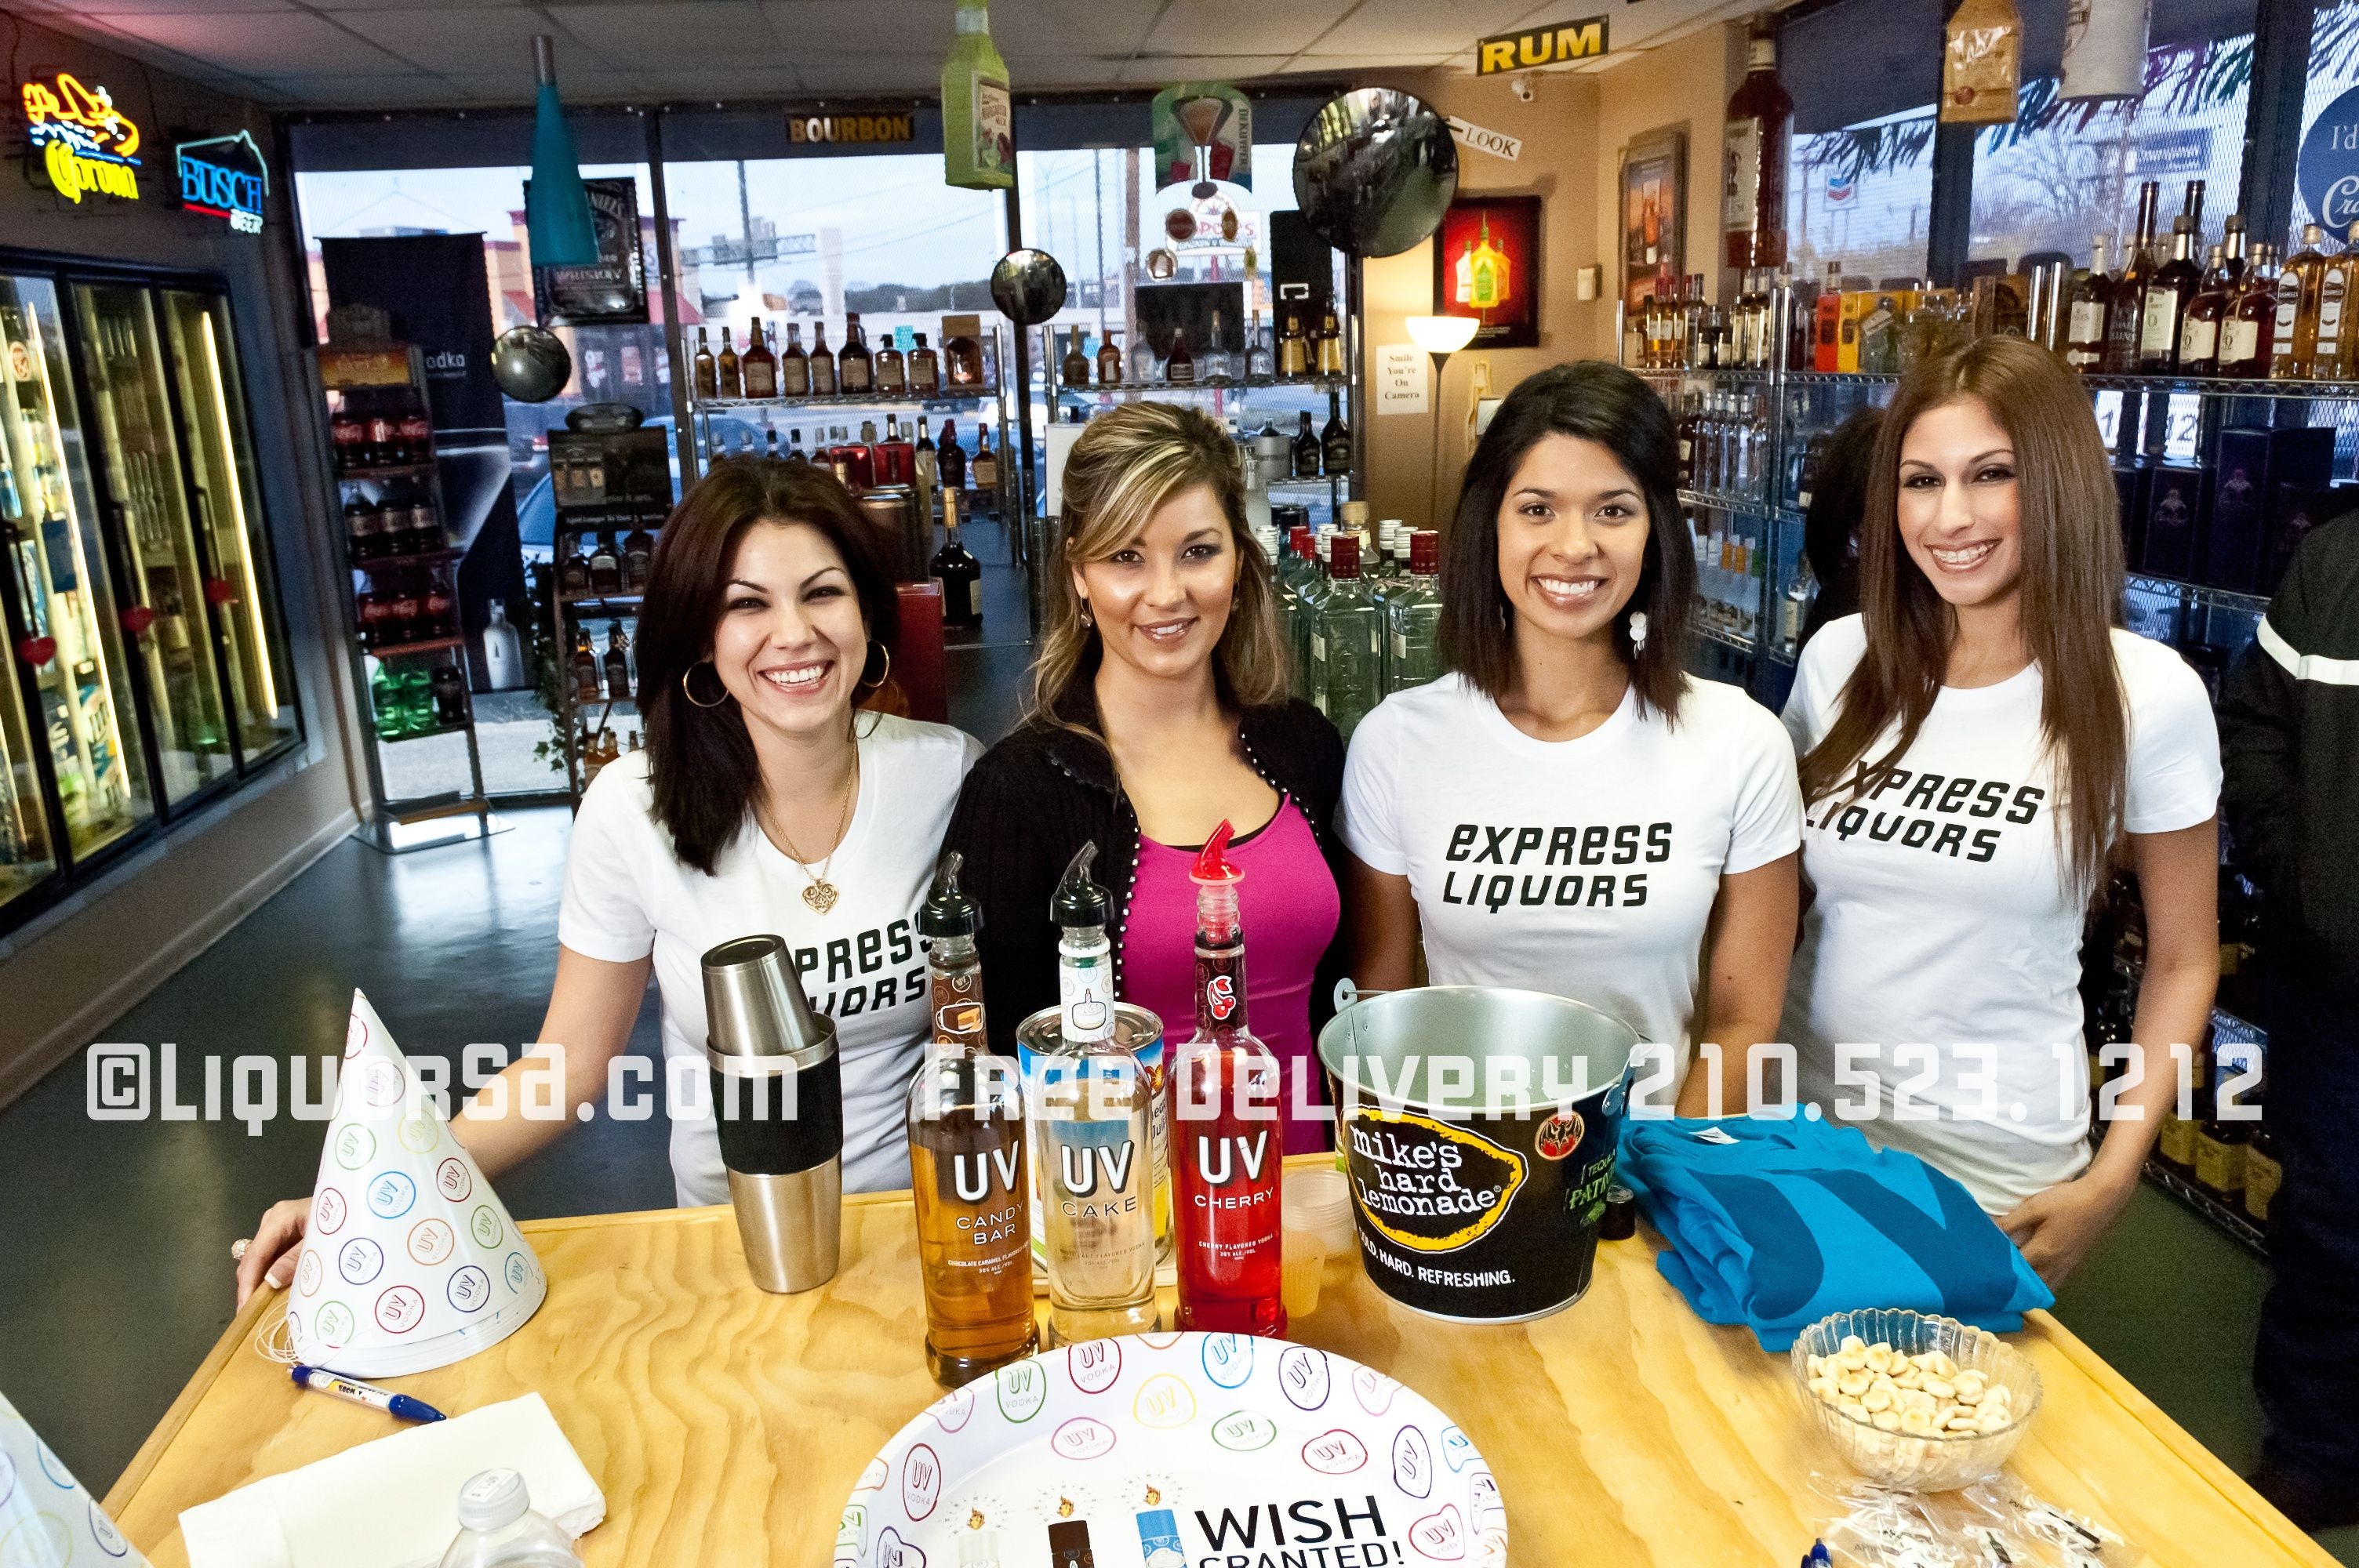 Express Liquor & Emporium - San Antonio Liquor Store #LiquorSA